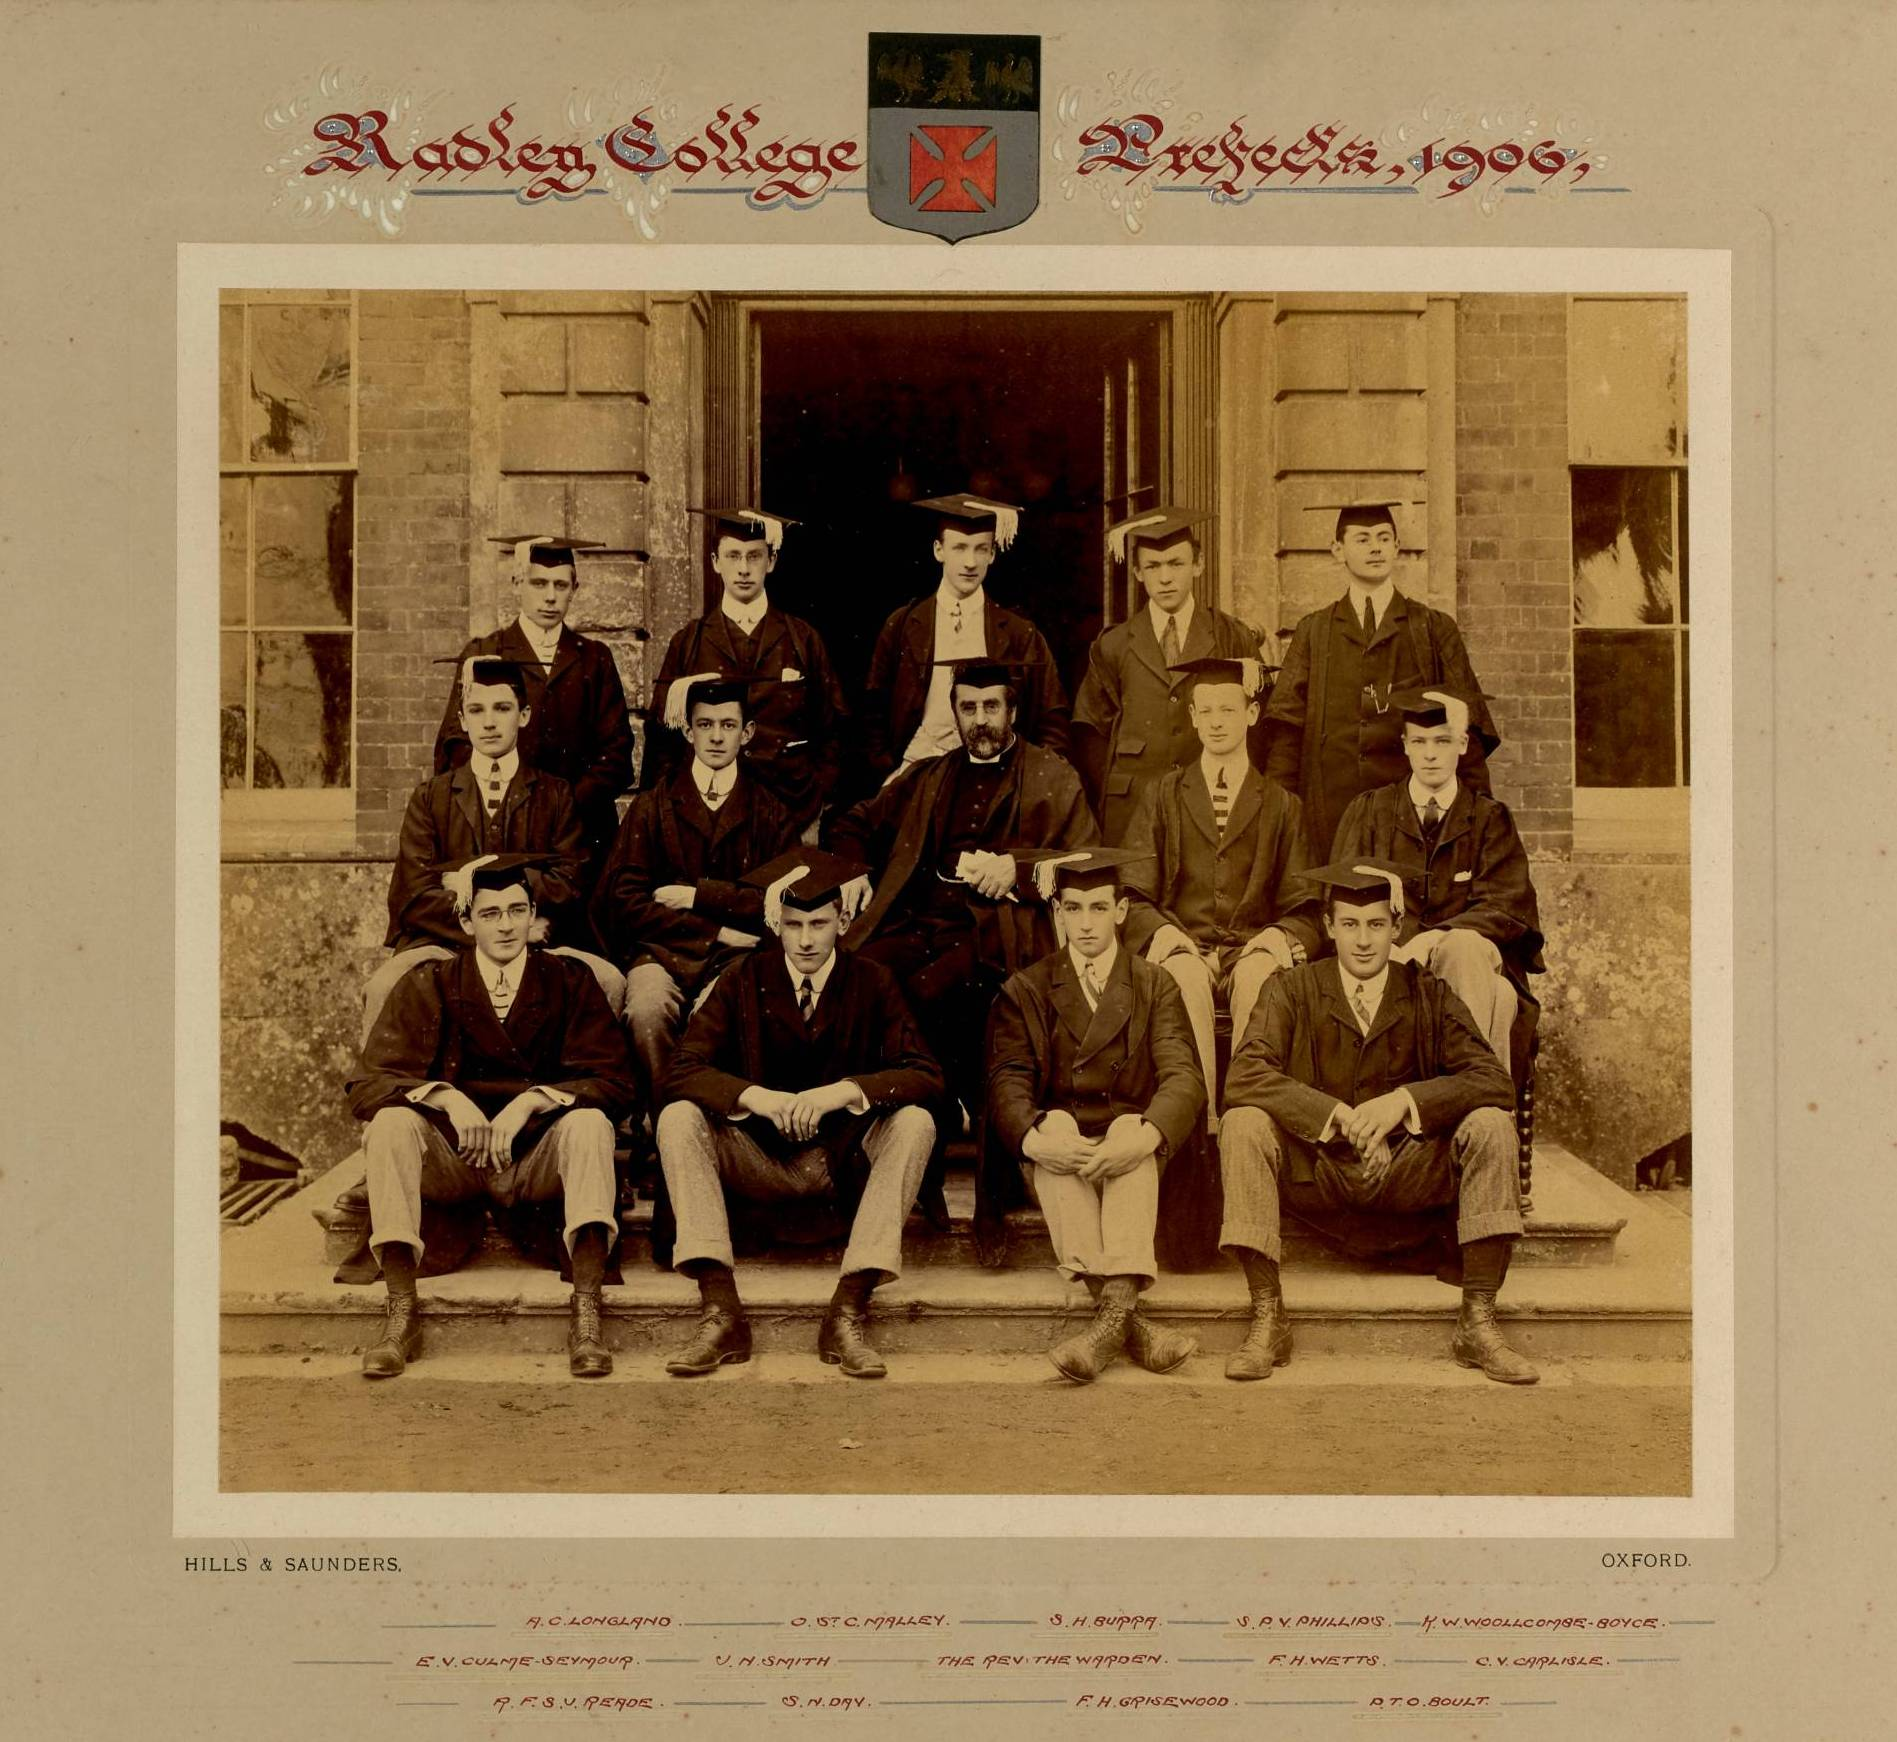 Radley College prefects photographs 1906